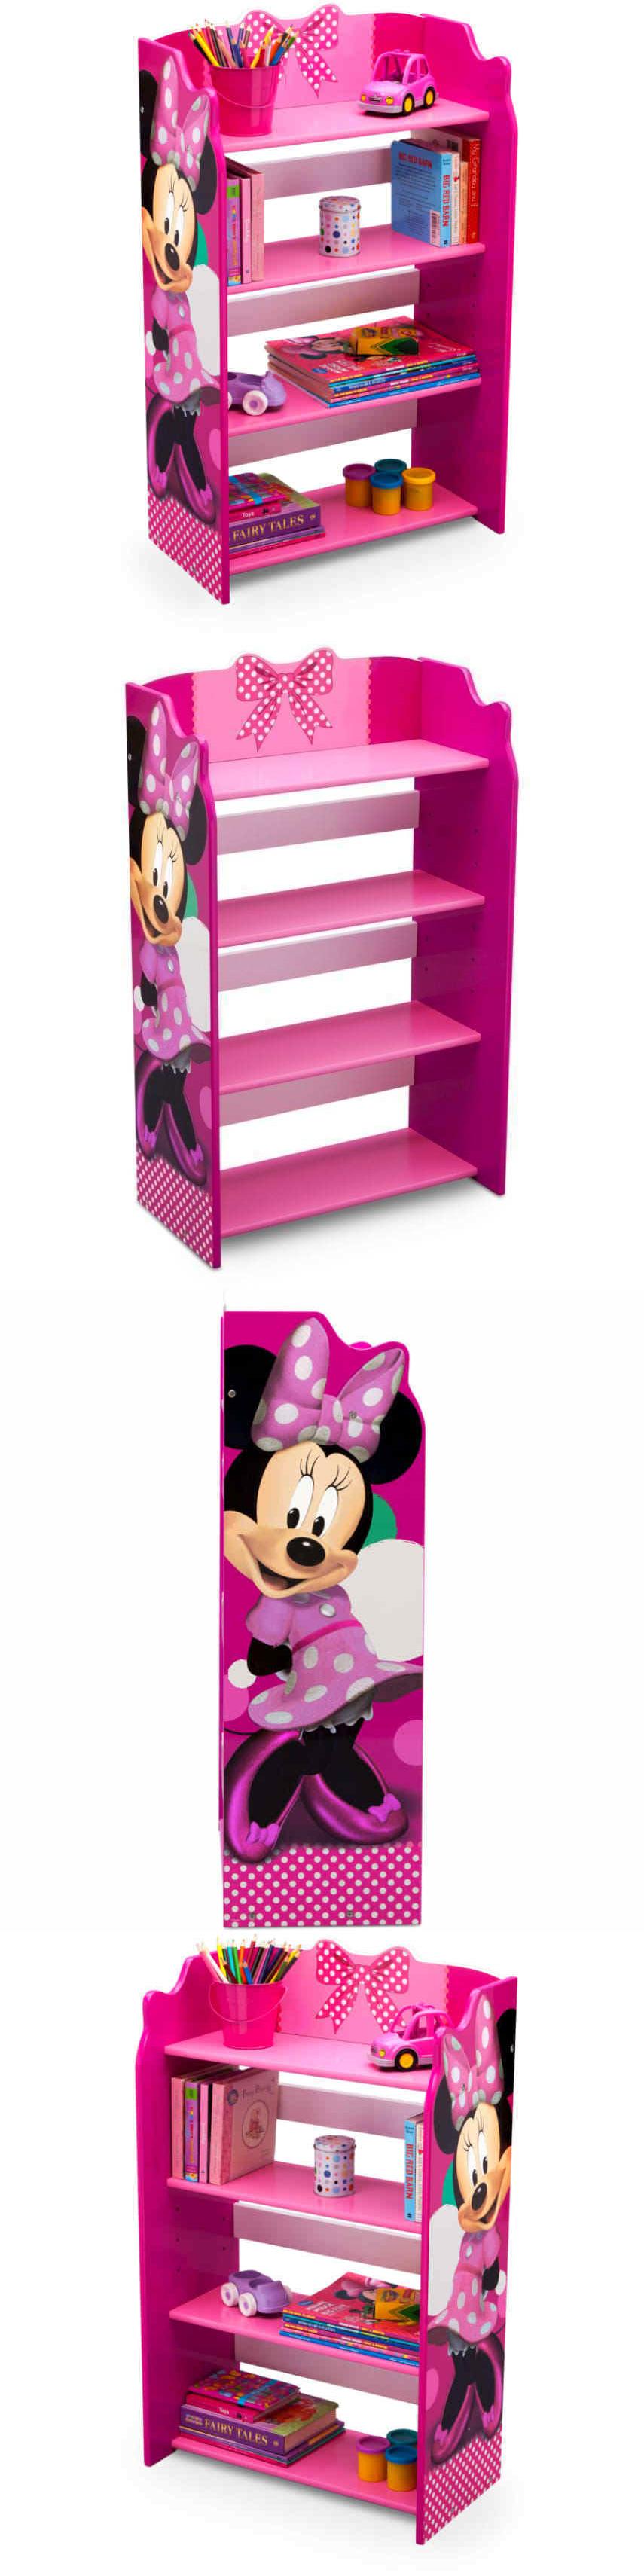 Toy Boxes 94932: Disney Bookshelf Toy Organizer Minnie Mouse Kid Cubby Book  Bin Storage Furniture